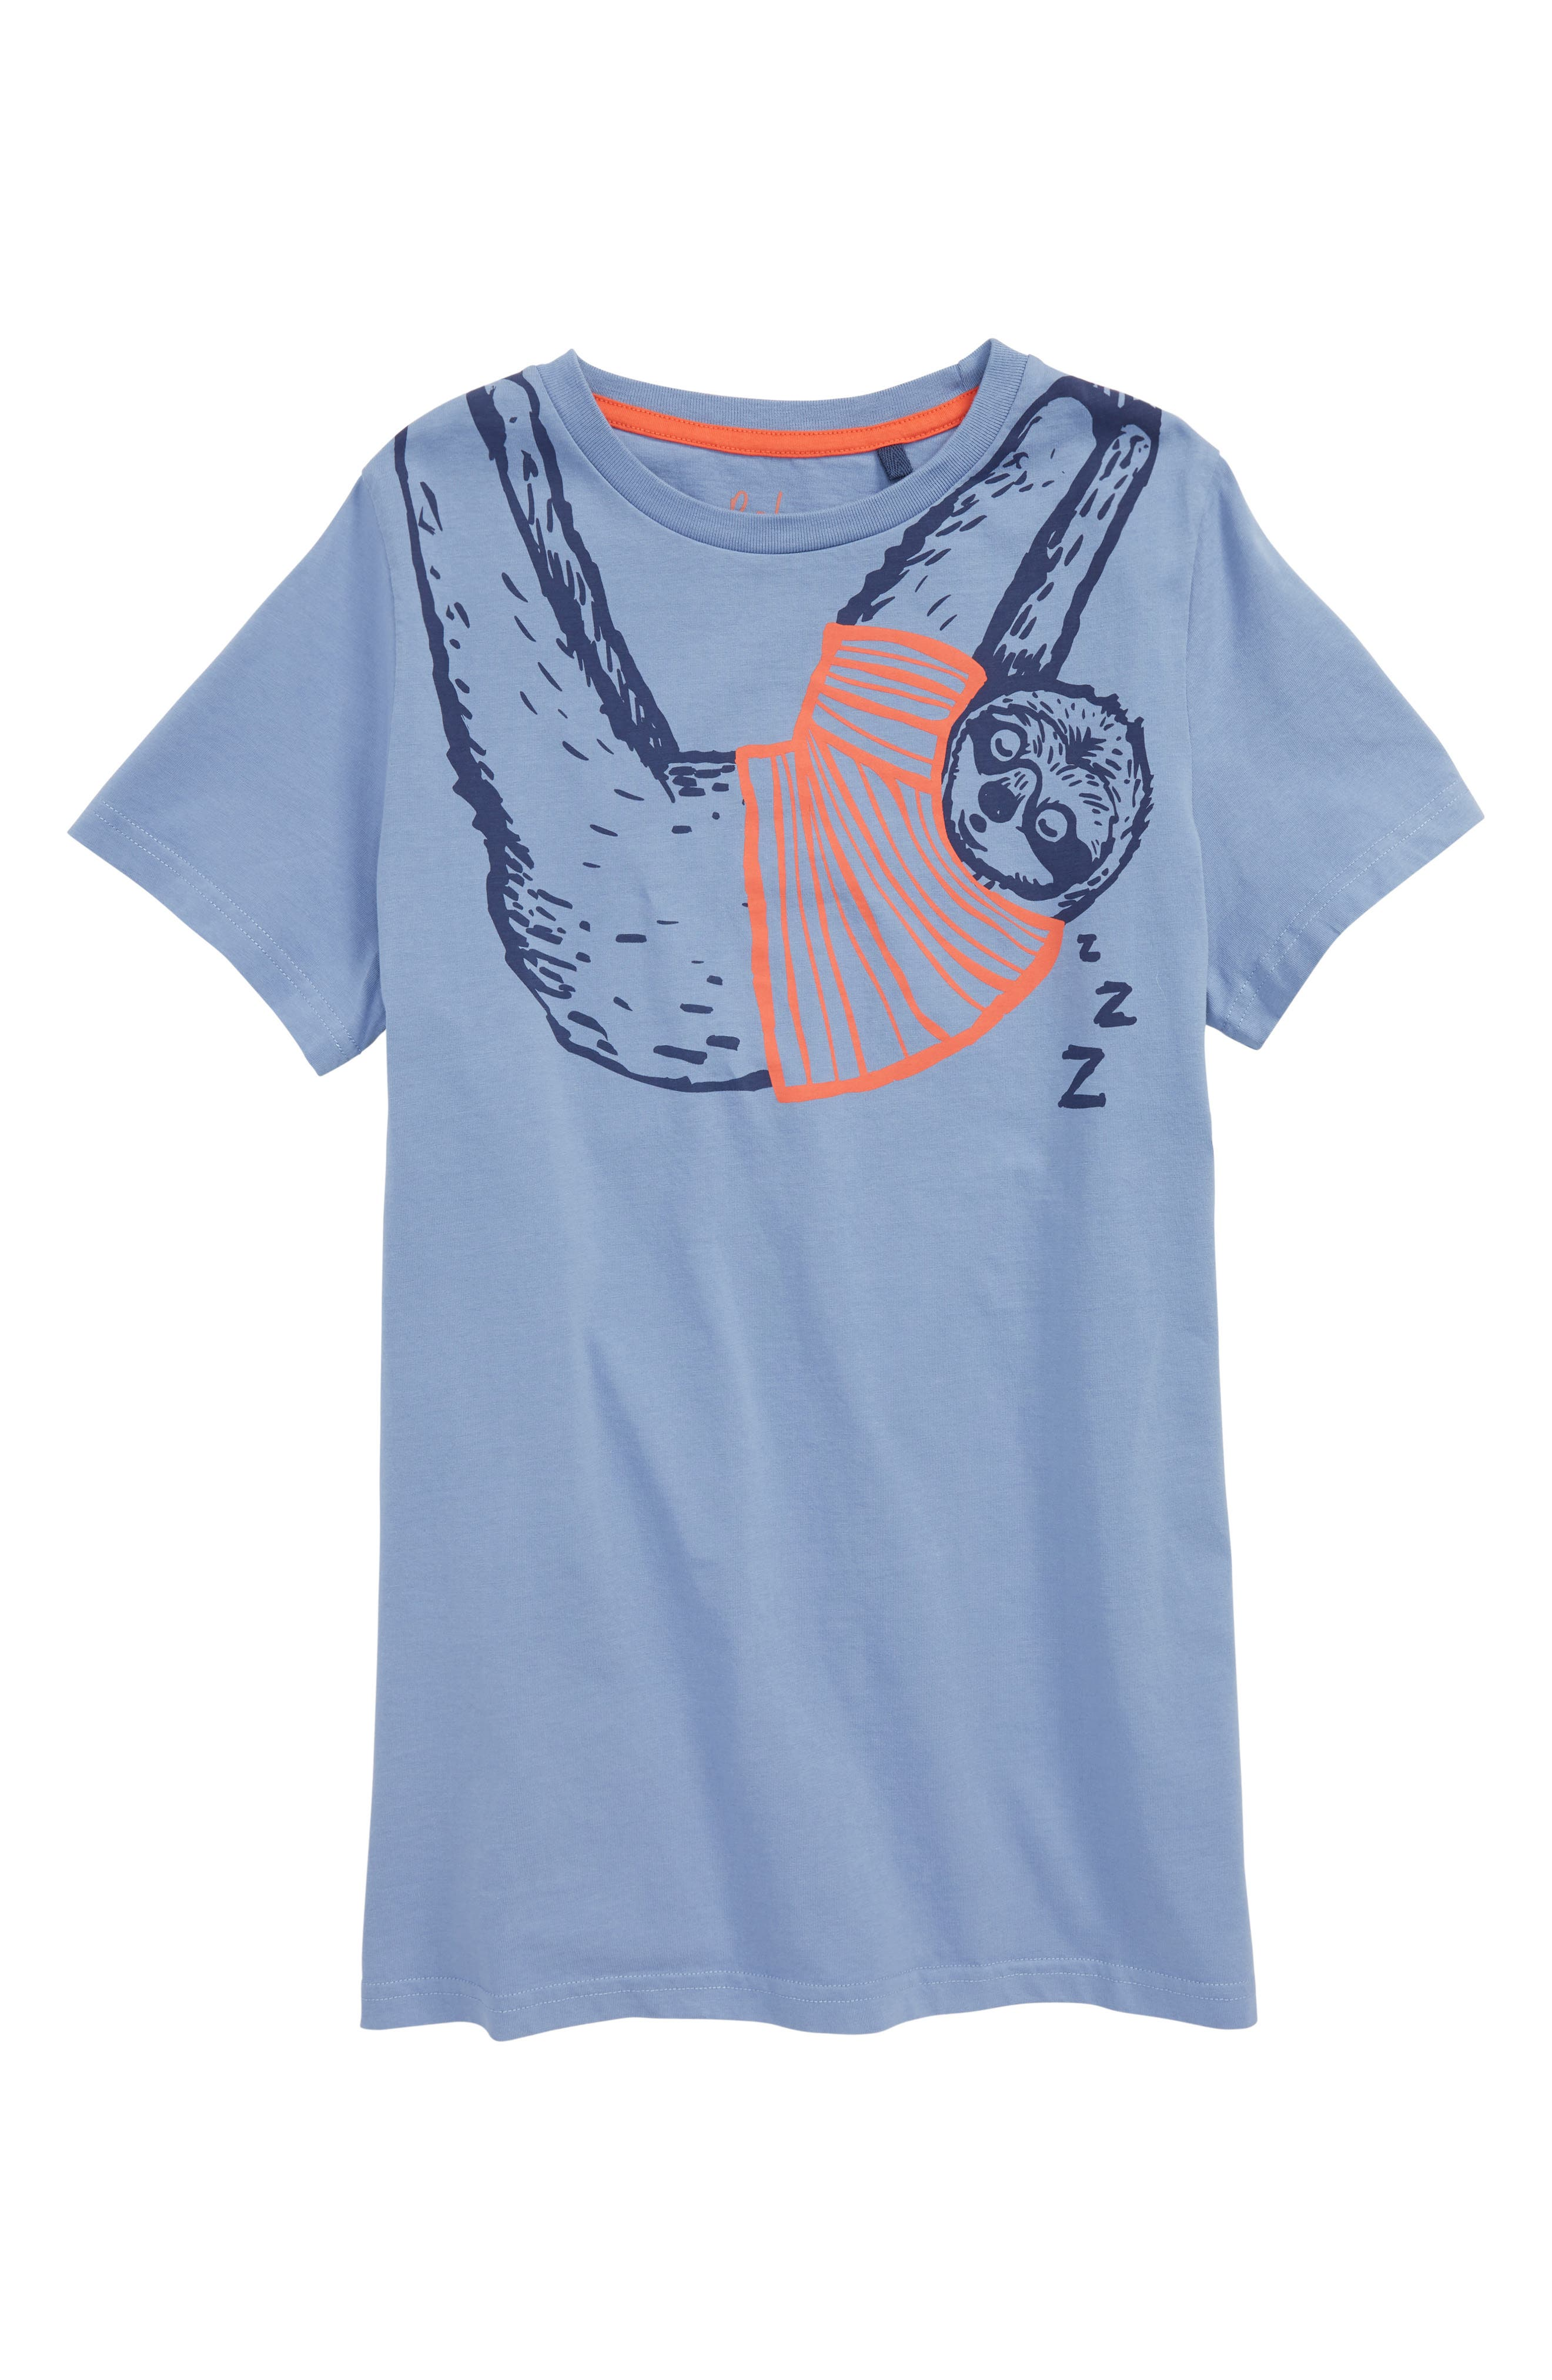 Arty Sloth T-Shirt,                         Main,                         color, Hook Blue Sloth